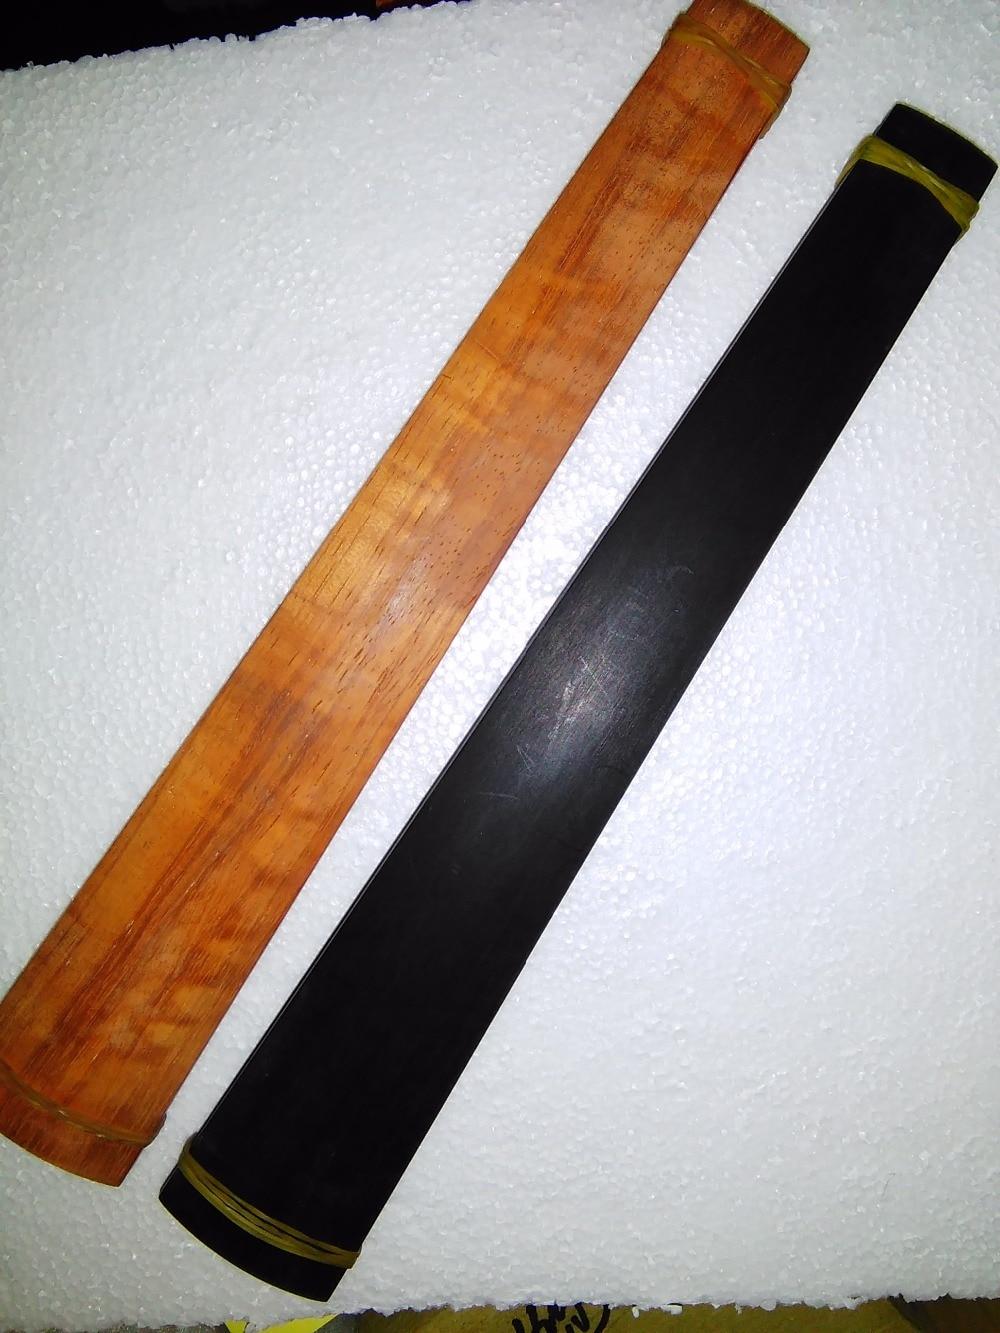 2 PCs Quality Violin Fingerboard 4/4 including 1 PC ebony fingerboard & 1 PC rose wood fingerboard enlarge